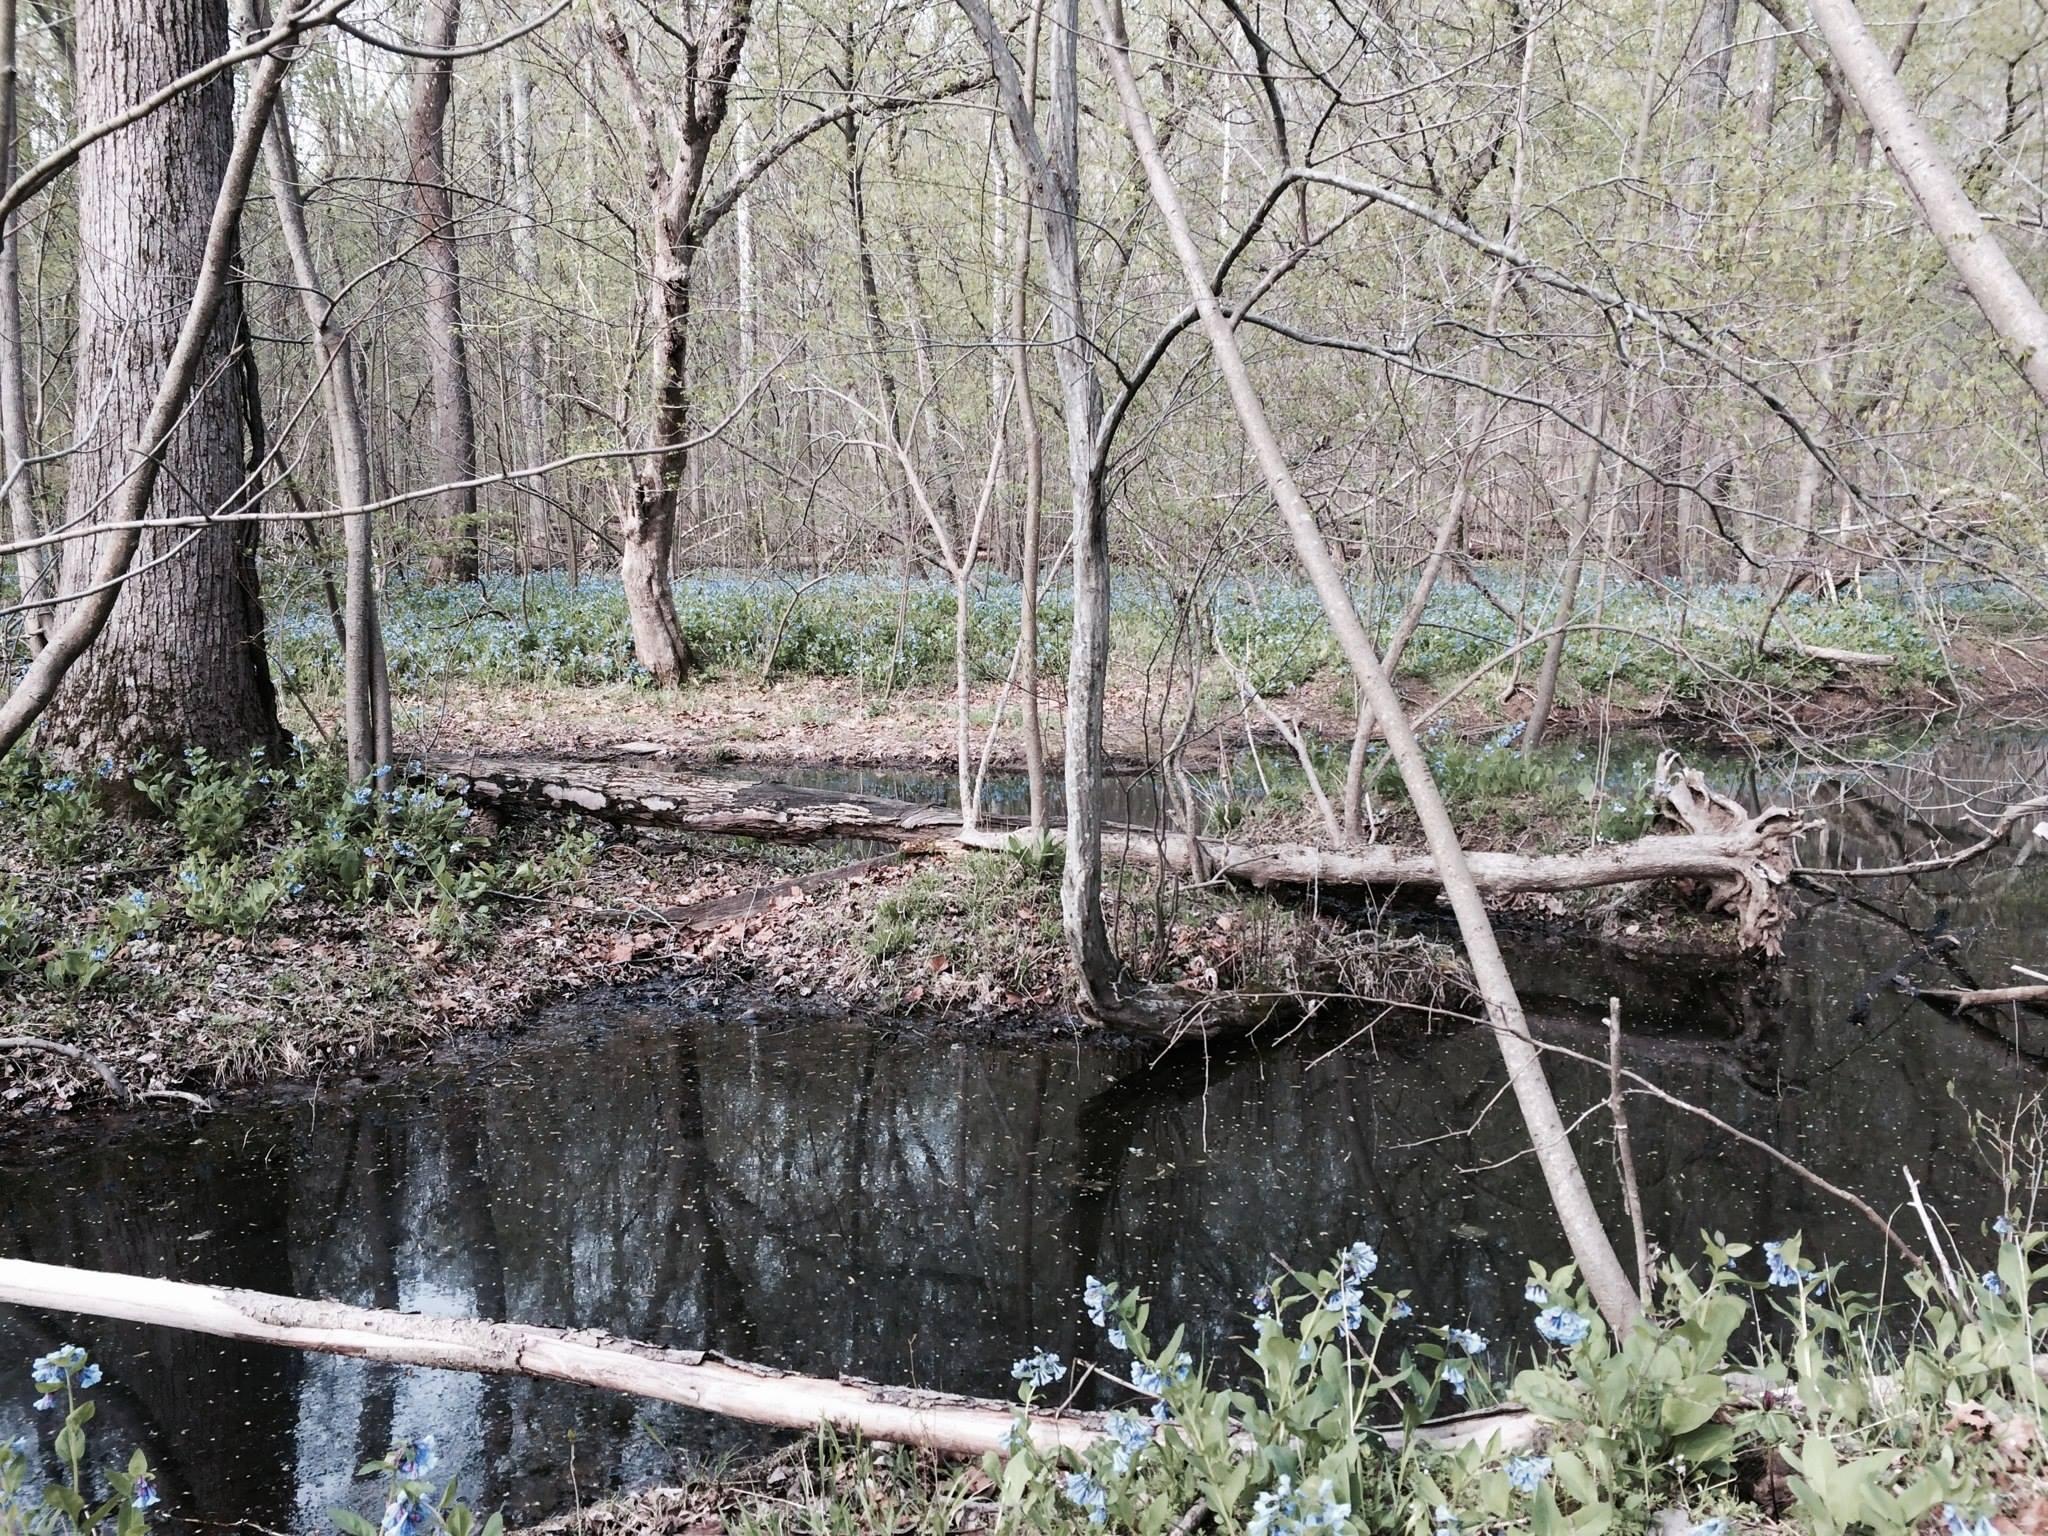 Bluebells on the Potomac River Flood Plain